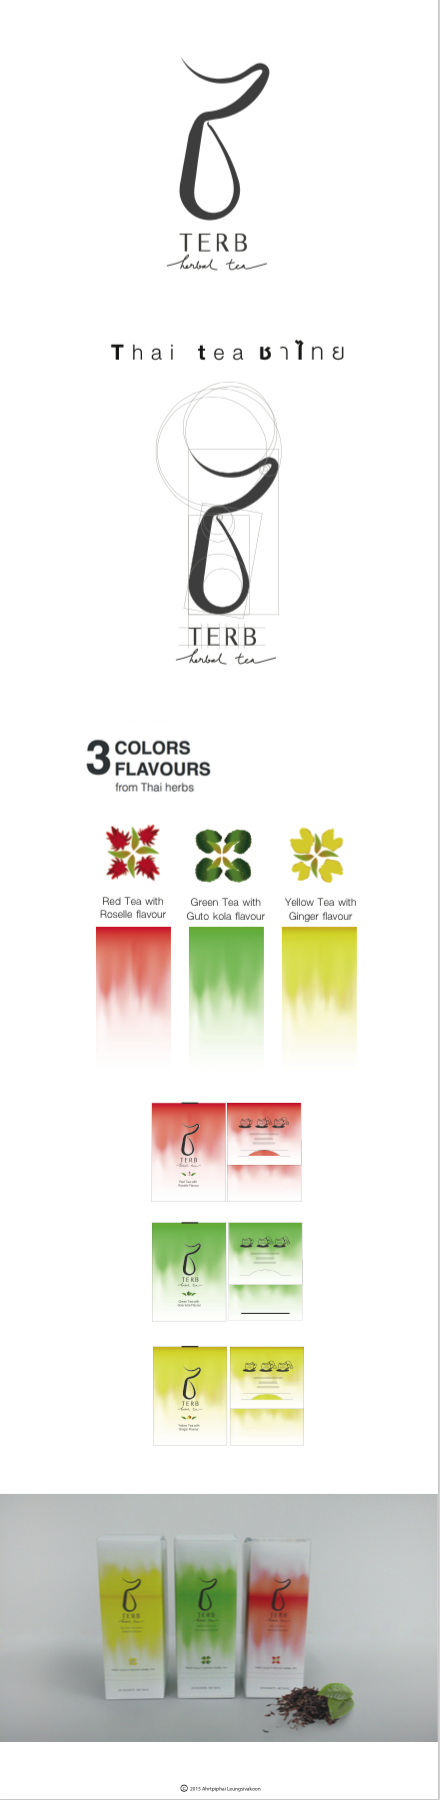 Logo design, package design, graphic design. Tea package design. A Thai contemporary concept, combine thai herb and tea created a new flavor.